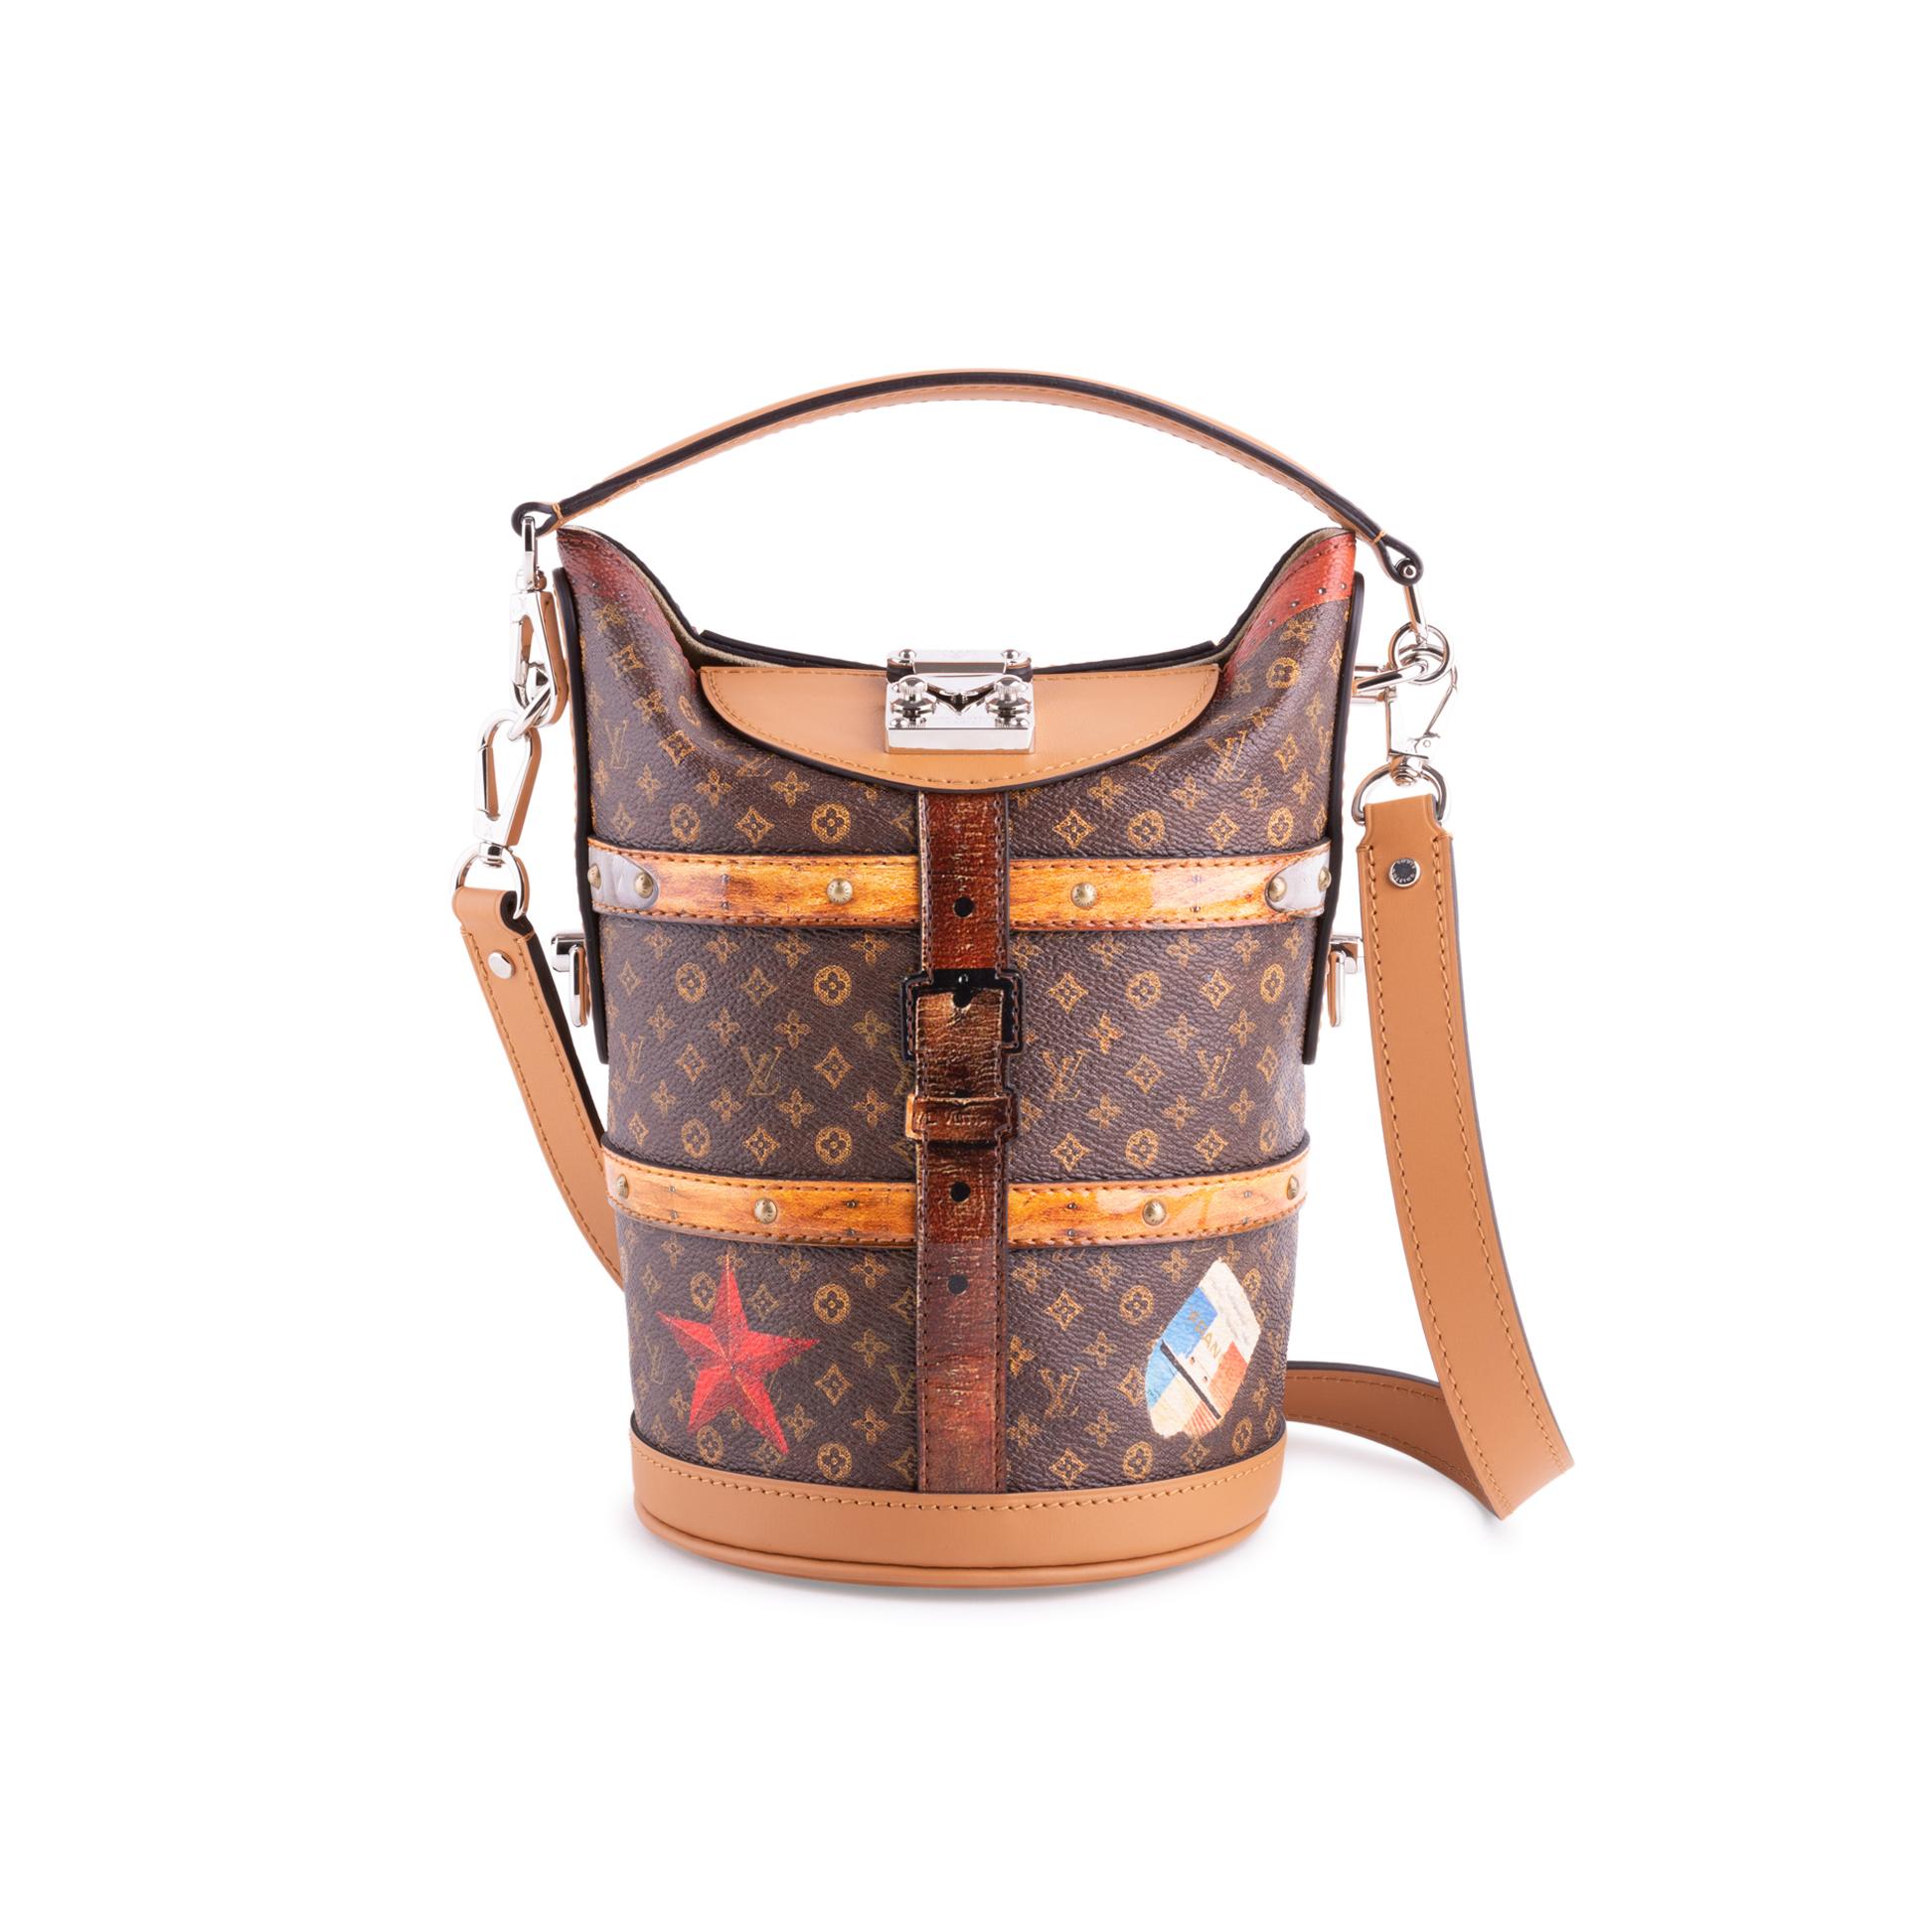 a72e82cb2171 Authentic Second Hand Louis Vuitton Duffle Time Trunk Handbag  (PSS-200-01675)